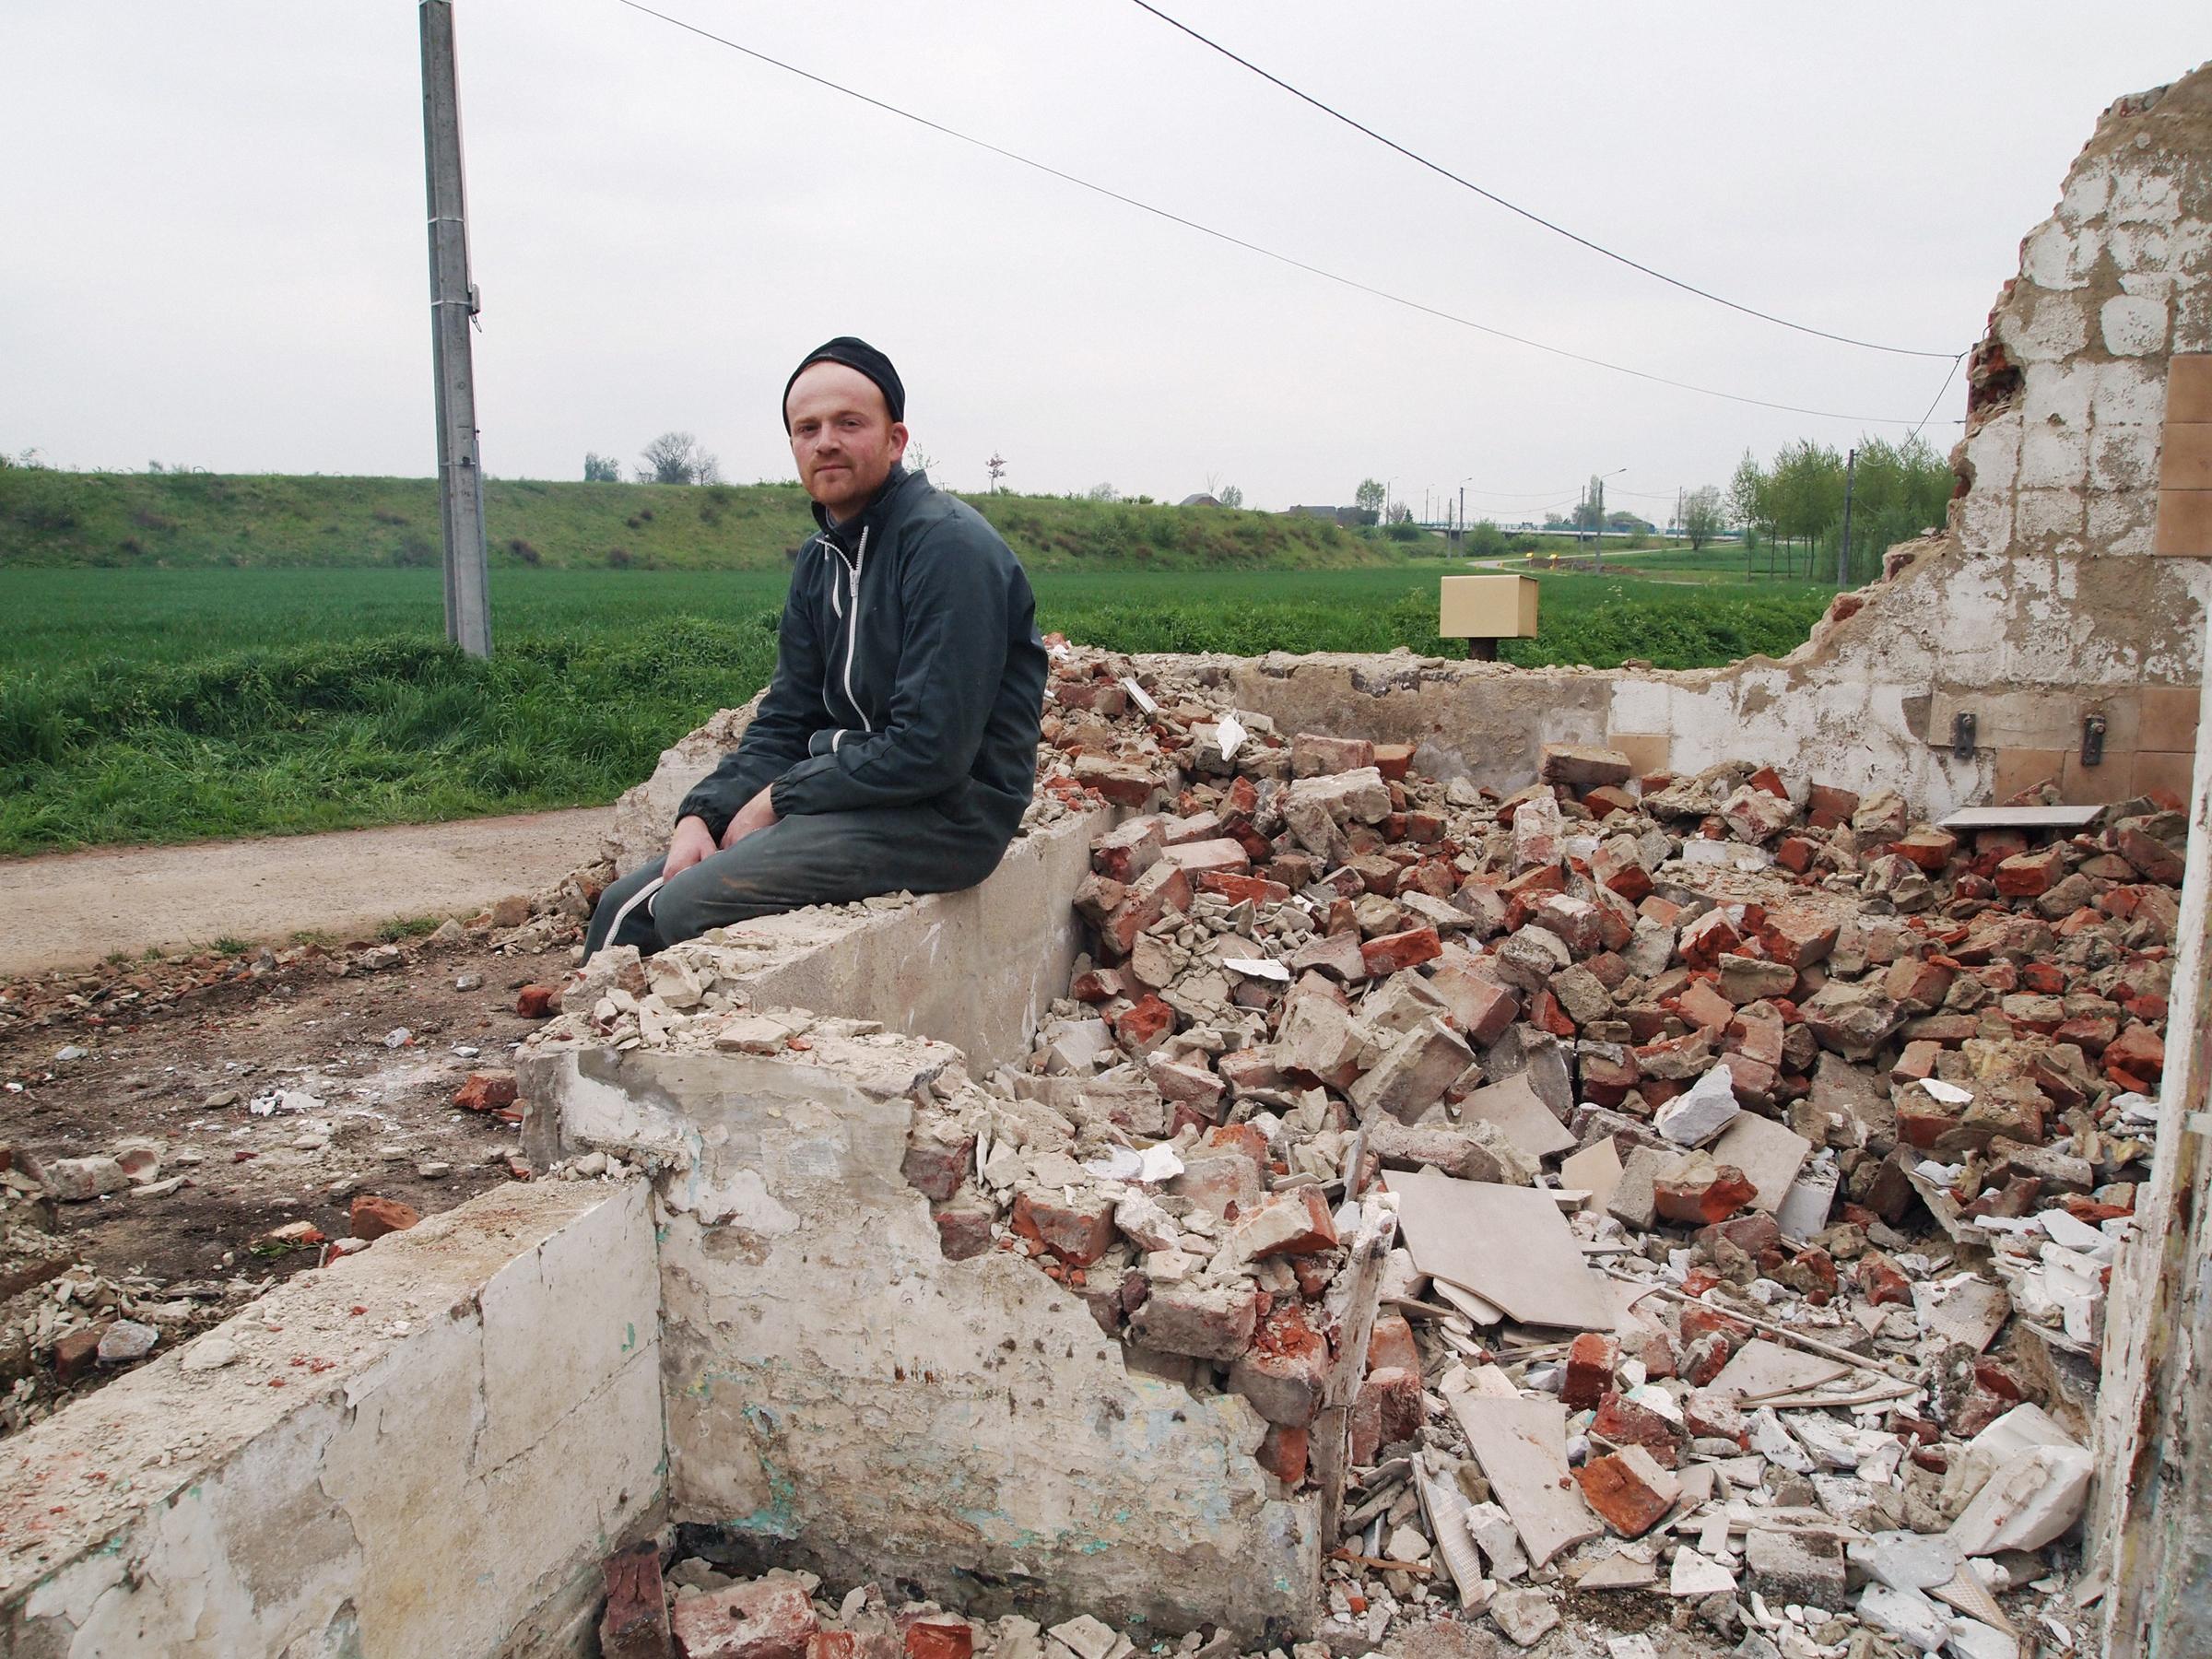 Deschamps de ruine